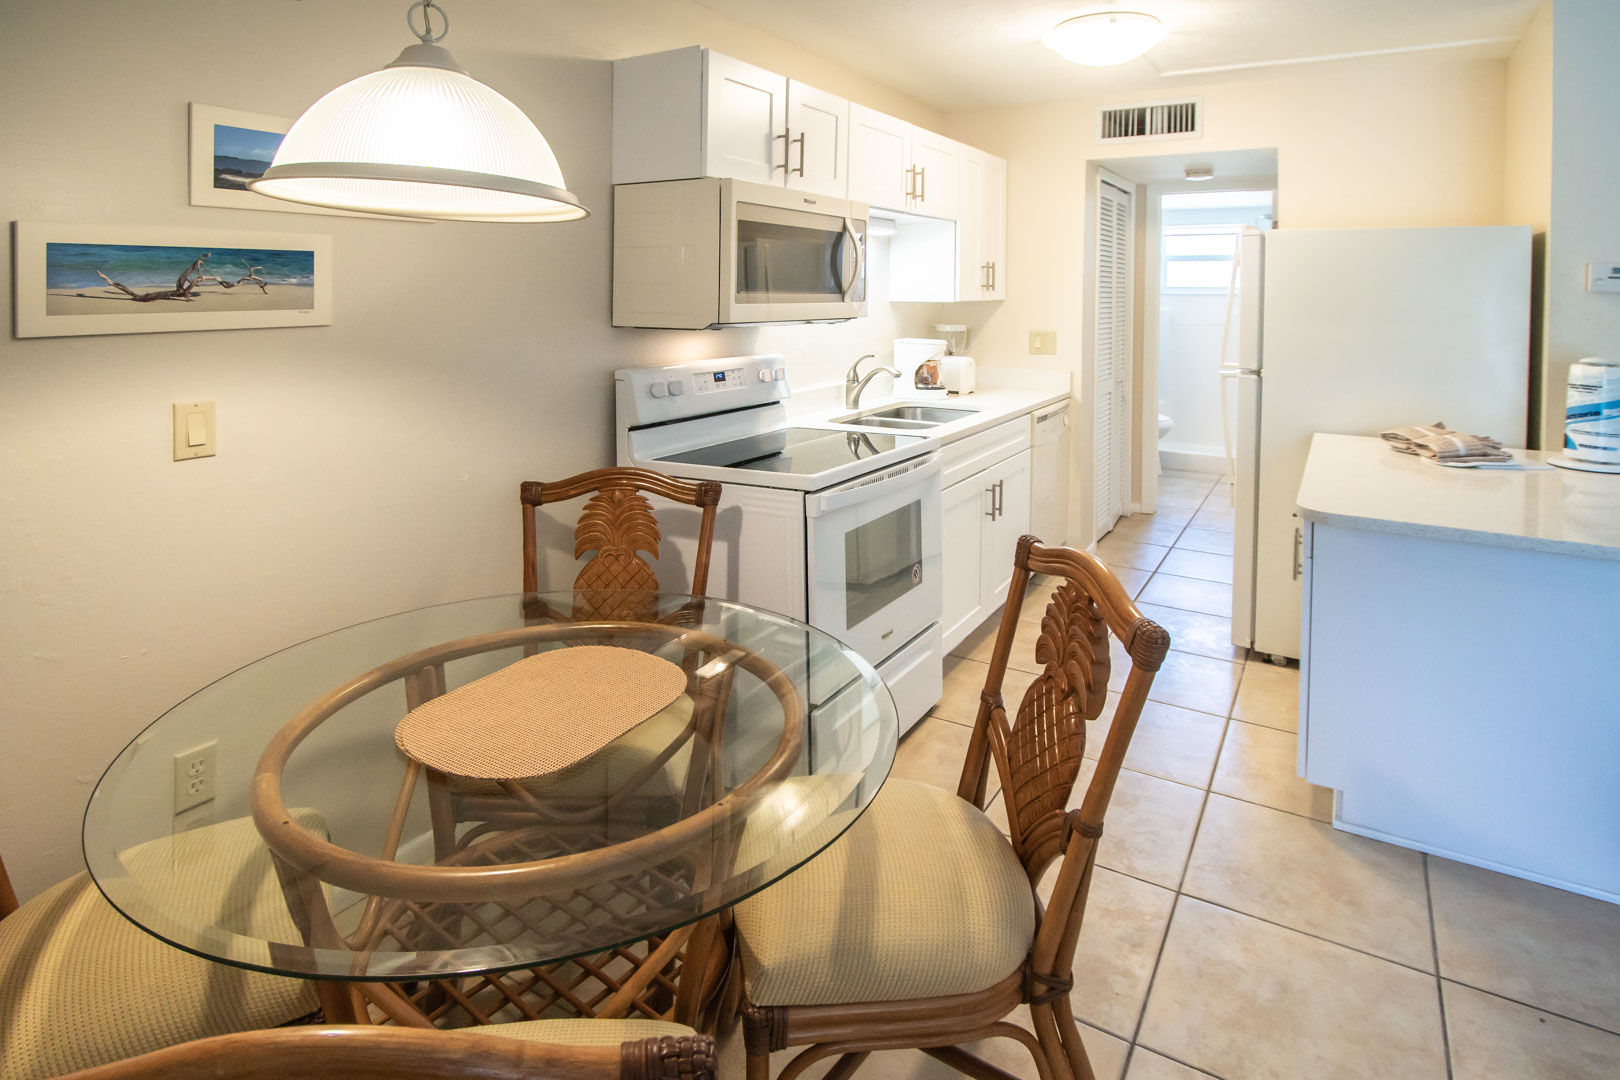 A clean kitchen at VRI's Windward Passage Resort in Fort Myers Beach, Florida.